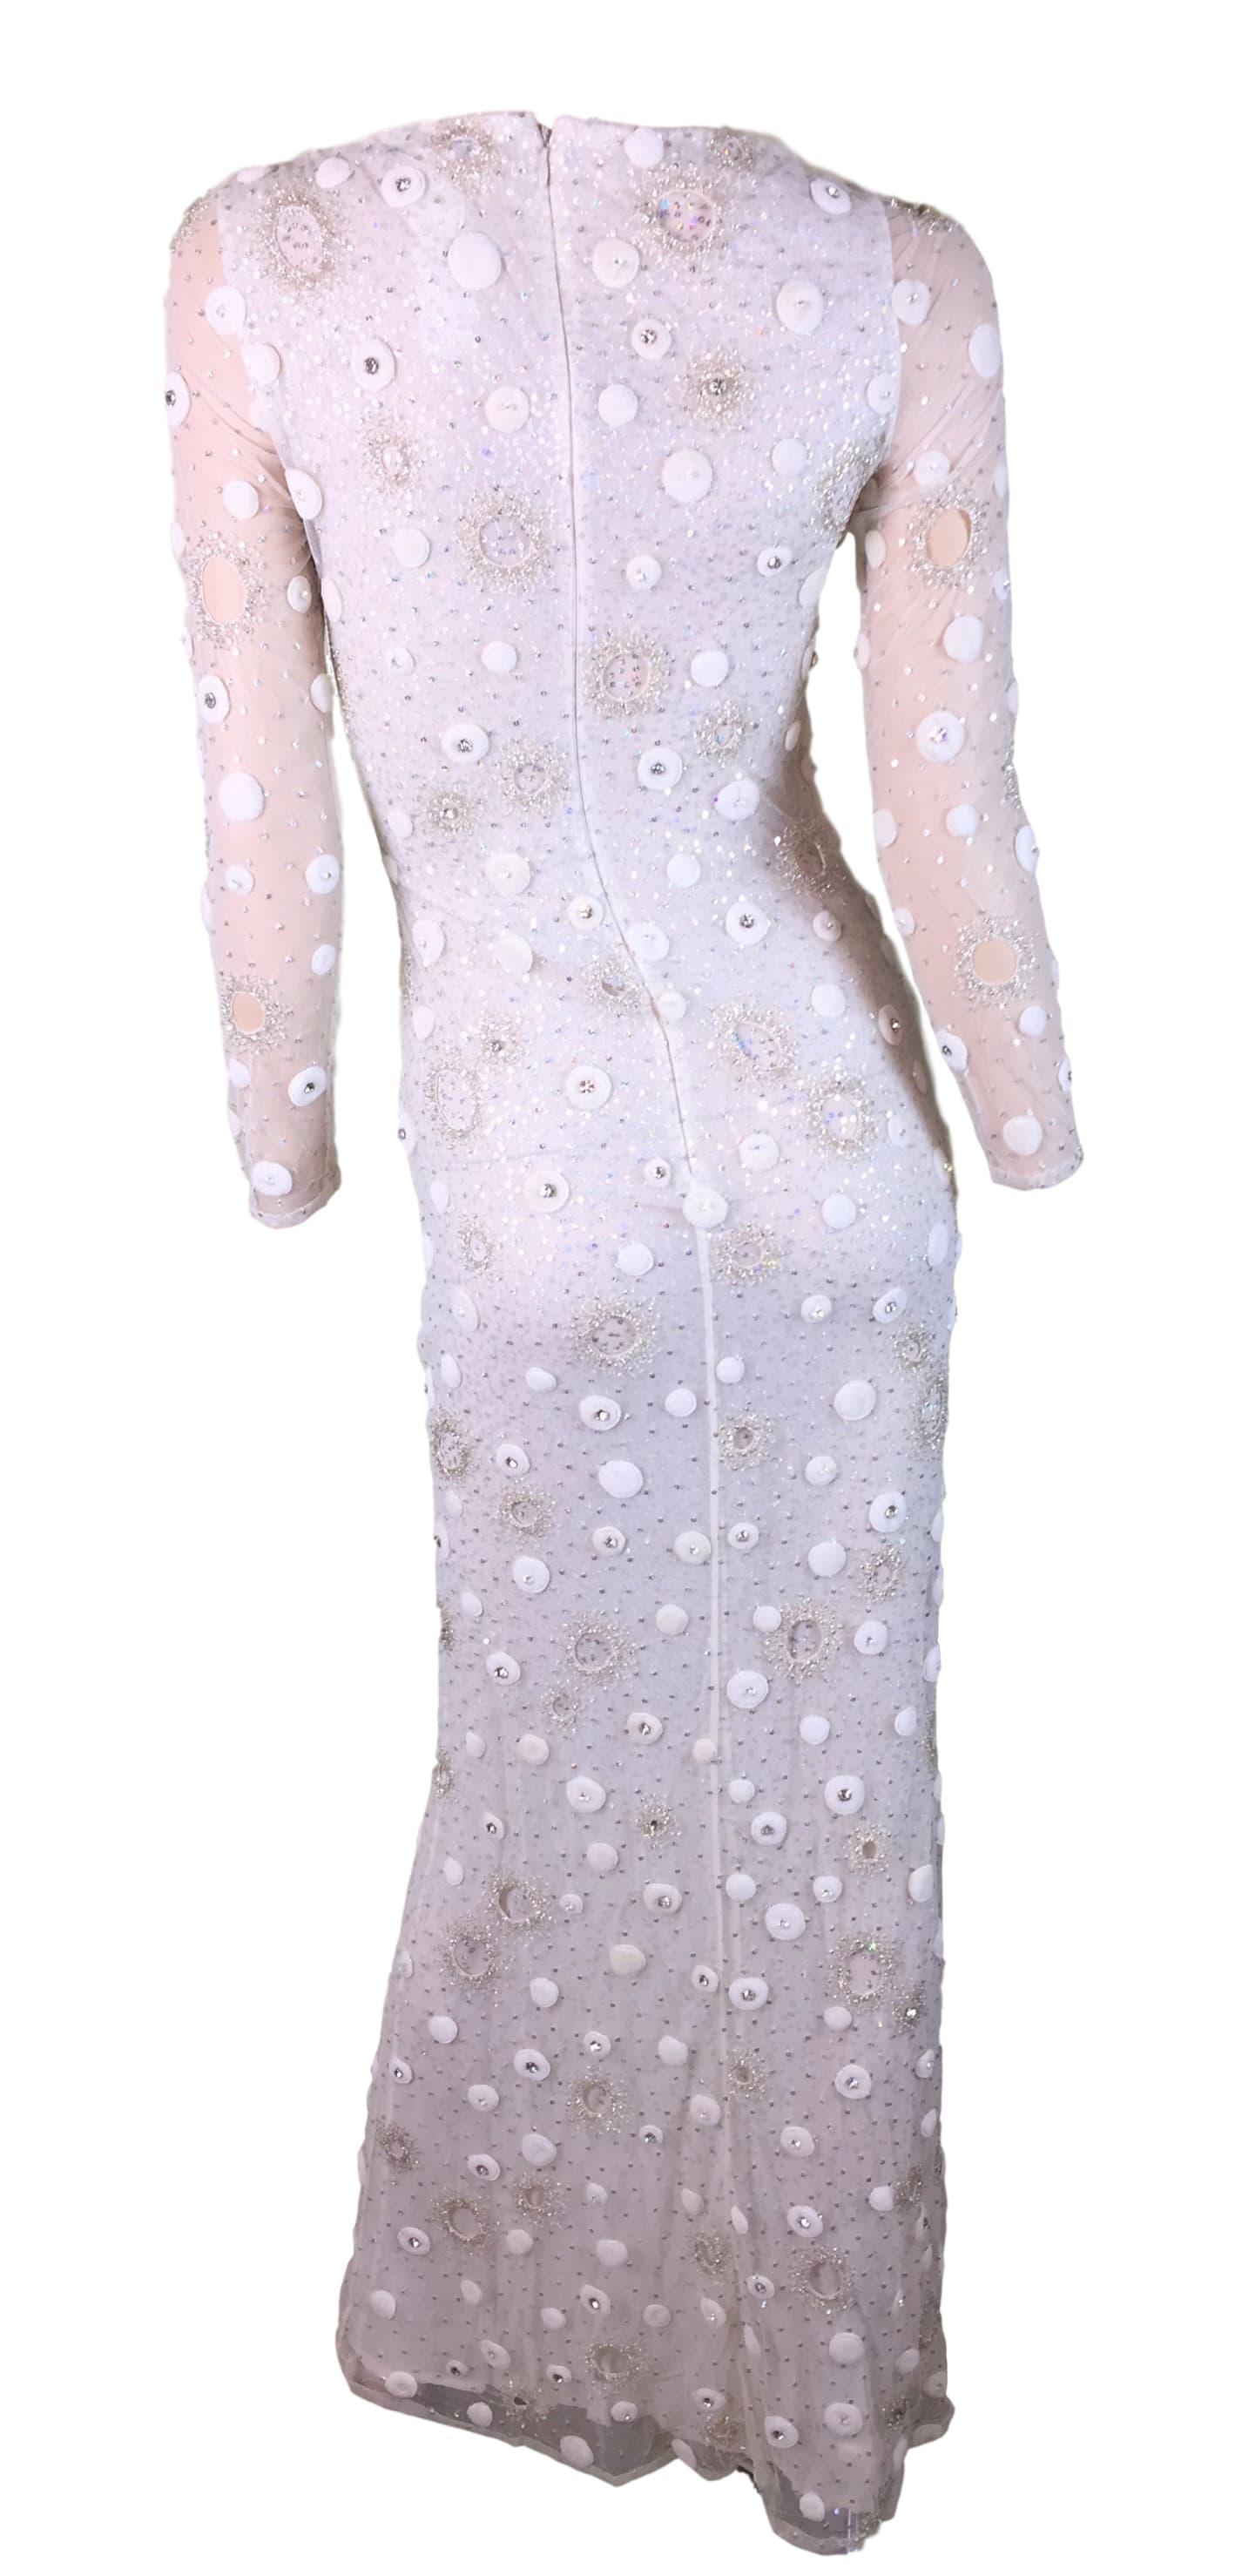 S/S 1999 Atelier Versace Sheer Ivory Silk Embellished Wedding Bridal ...